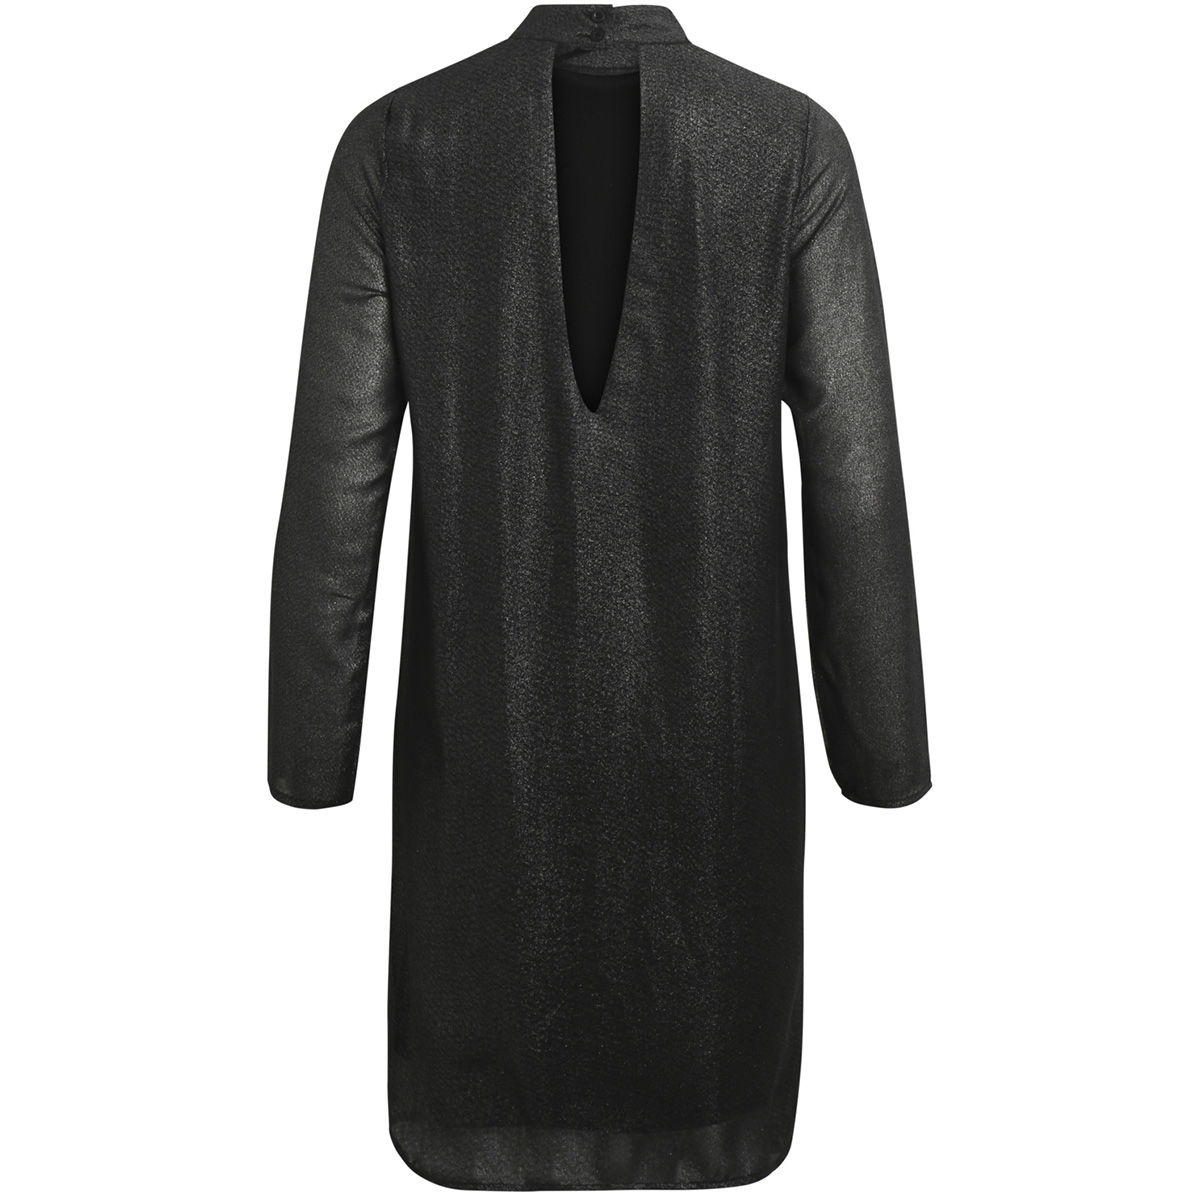 objglimmer l/s dress a bf 23026698 object jurk black silver foil